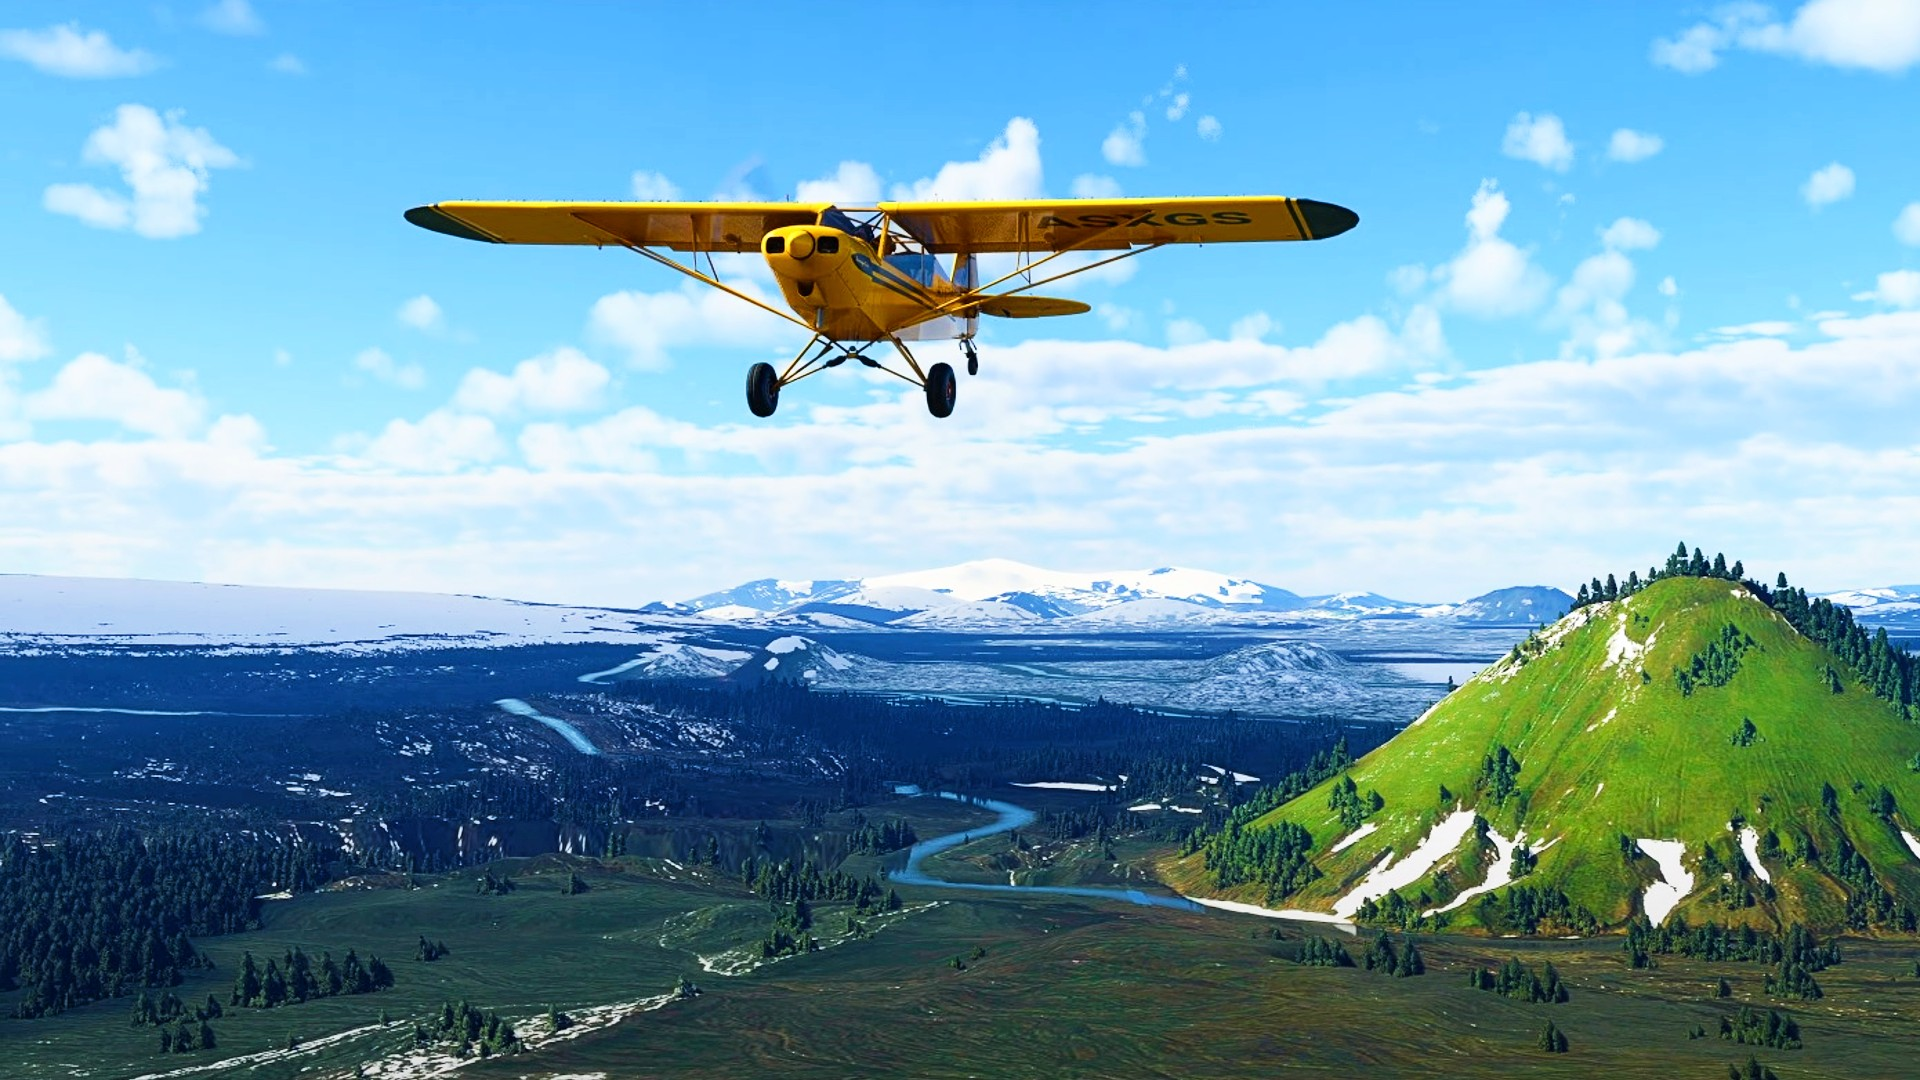 Microsoft Flight Simulator's Nordics world update looks stunning